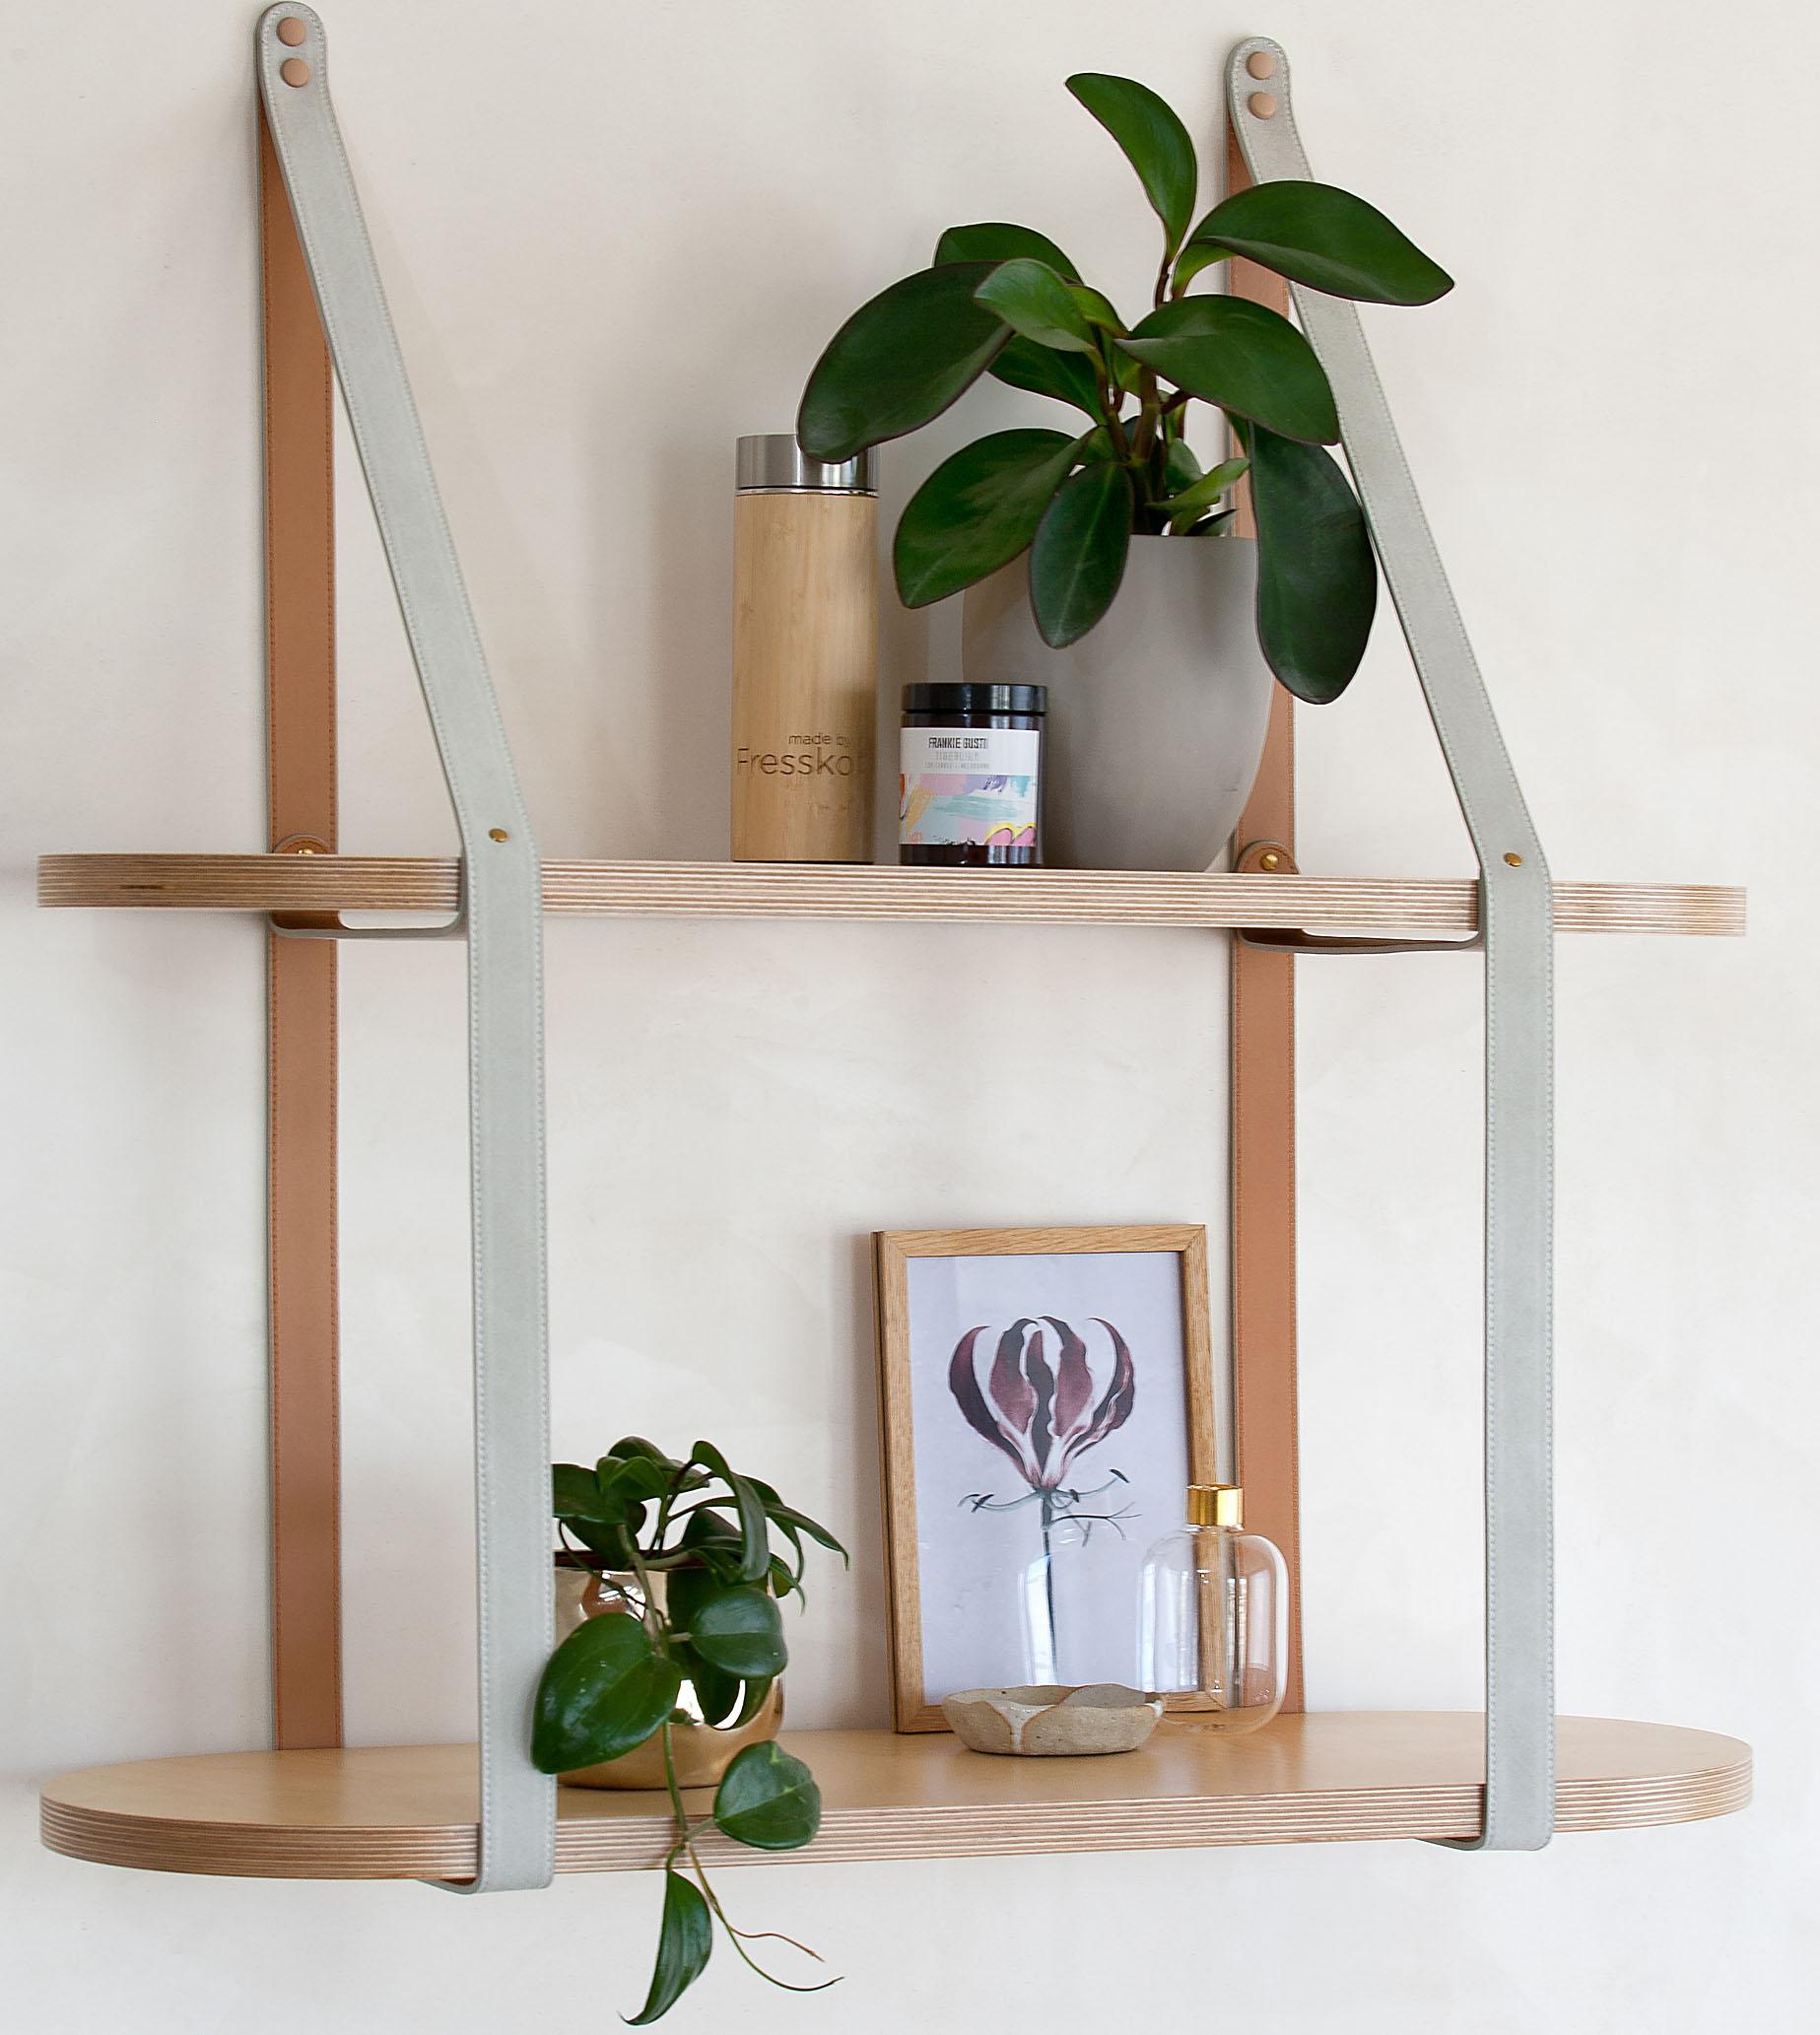 Round Leather Strap Shelf